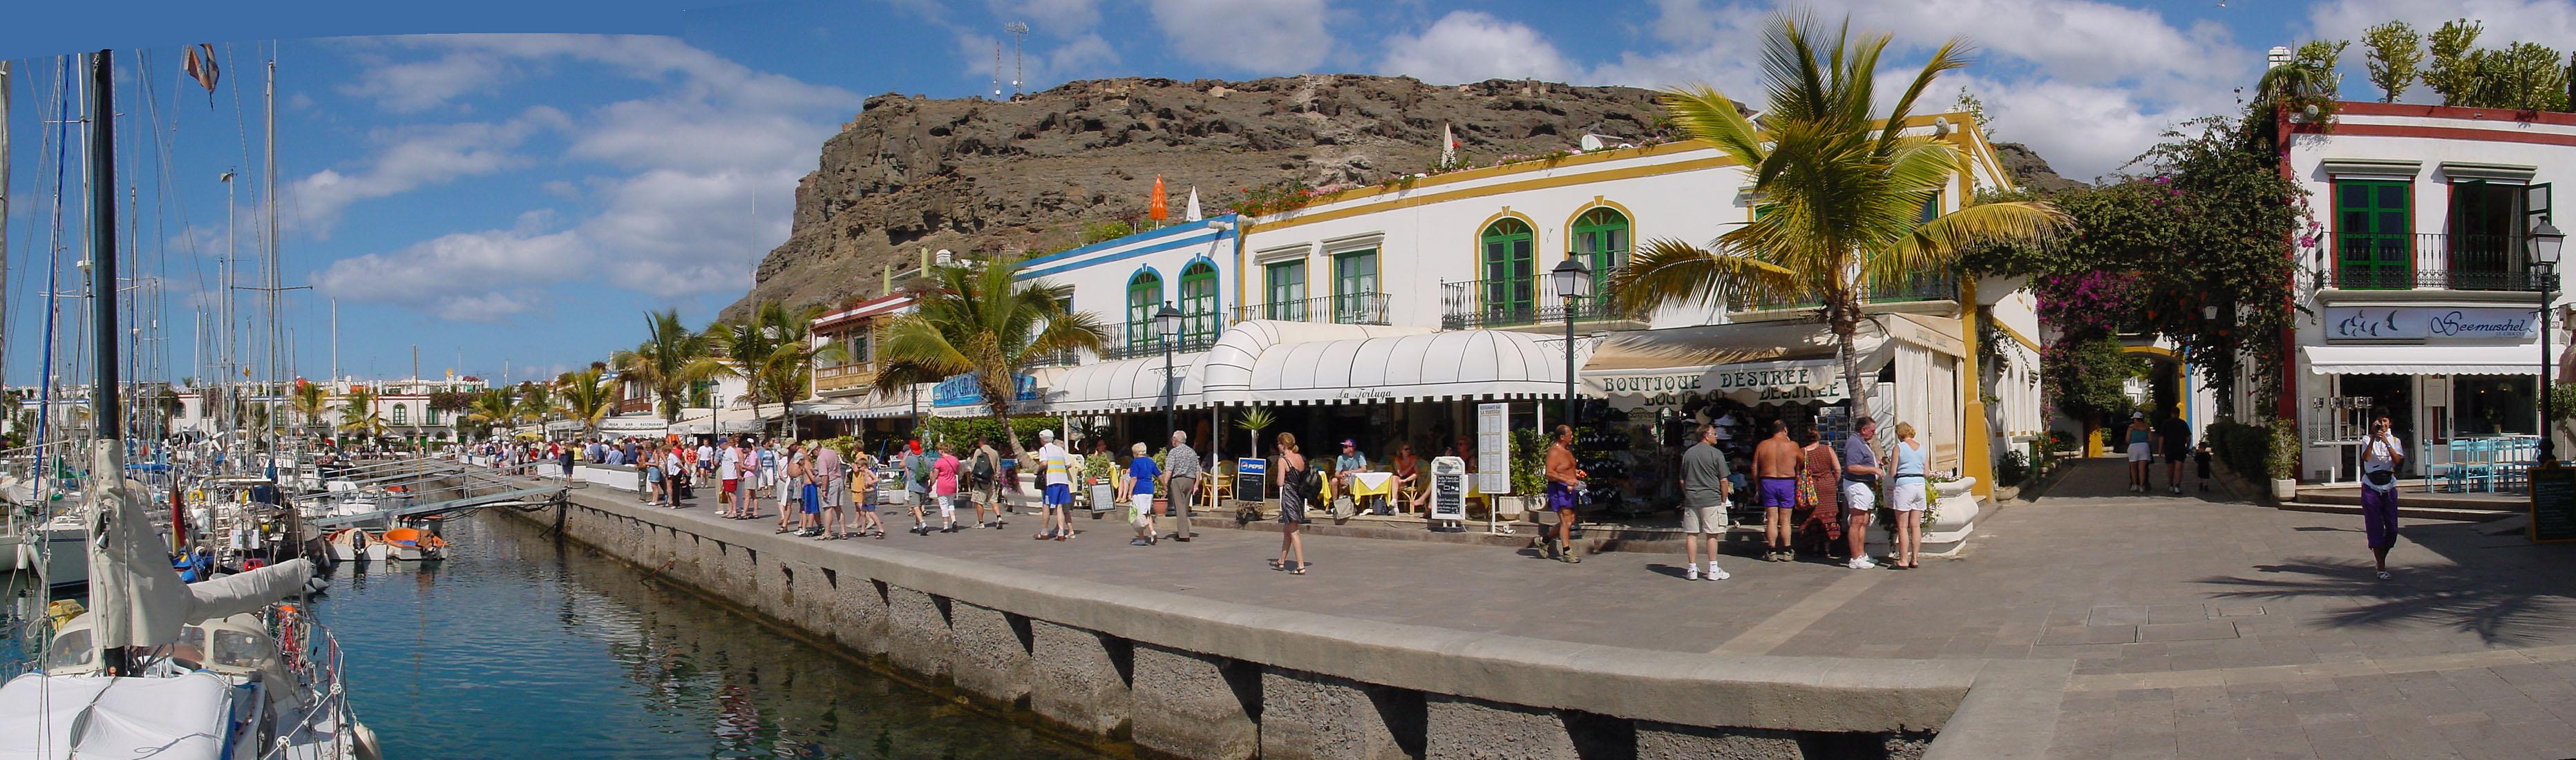 File puerto de wikimedia commons - Puerto mogan gran canaria ...